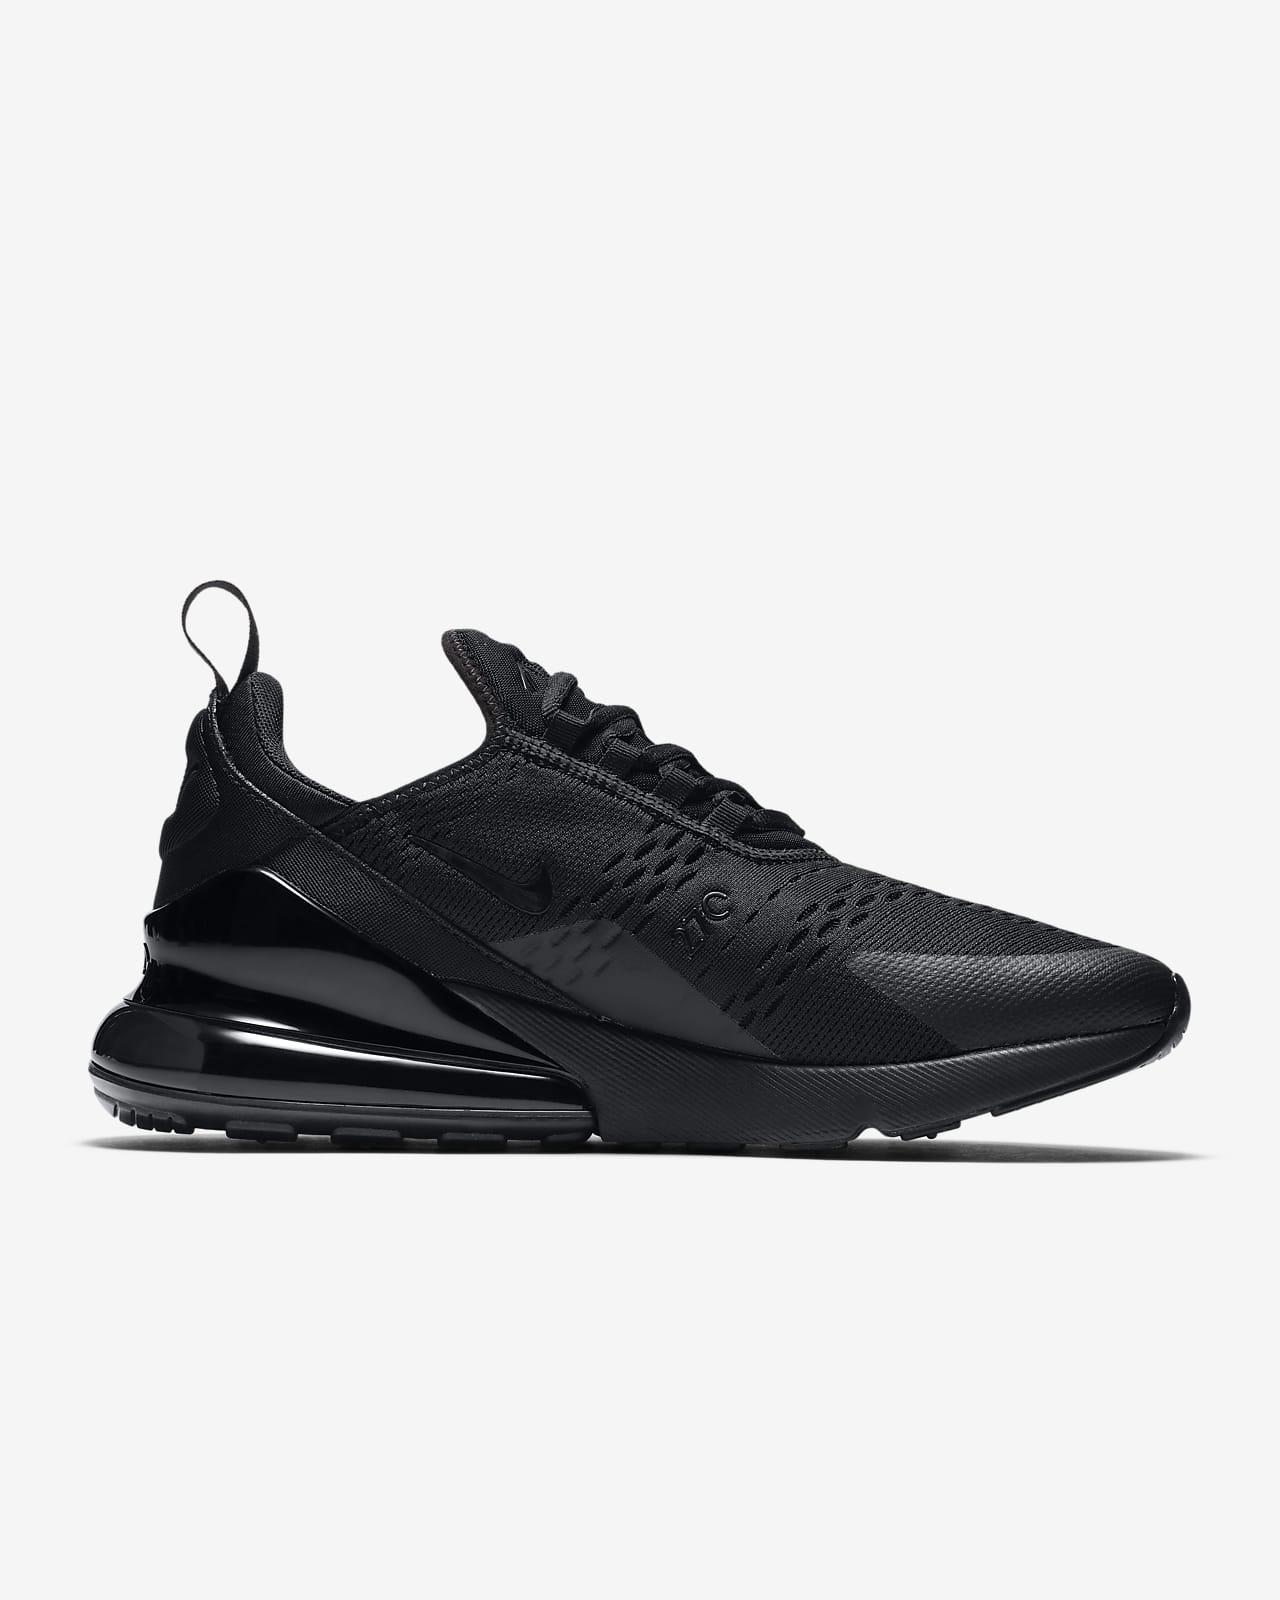 cargando Soberano Exquisito  Nike Air Max 270 Men's Shoe. Nike IN